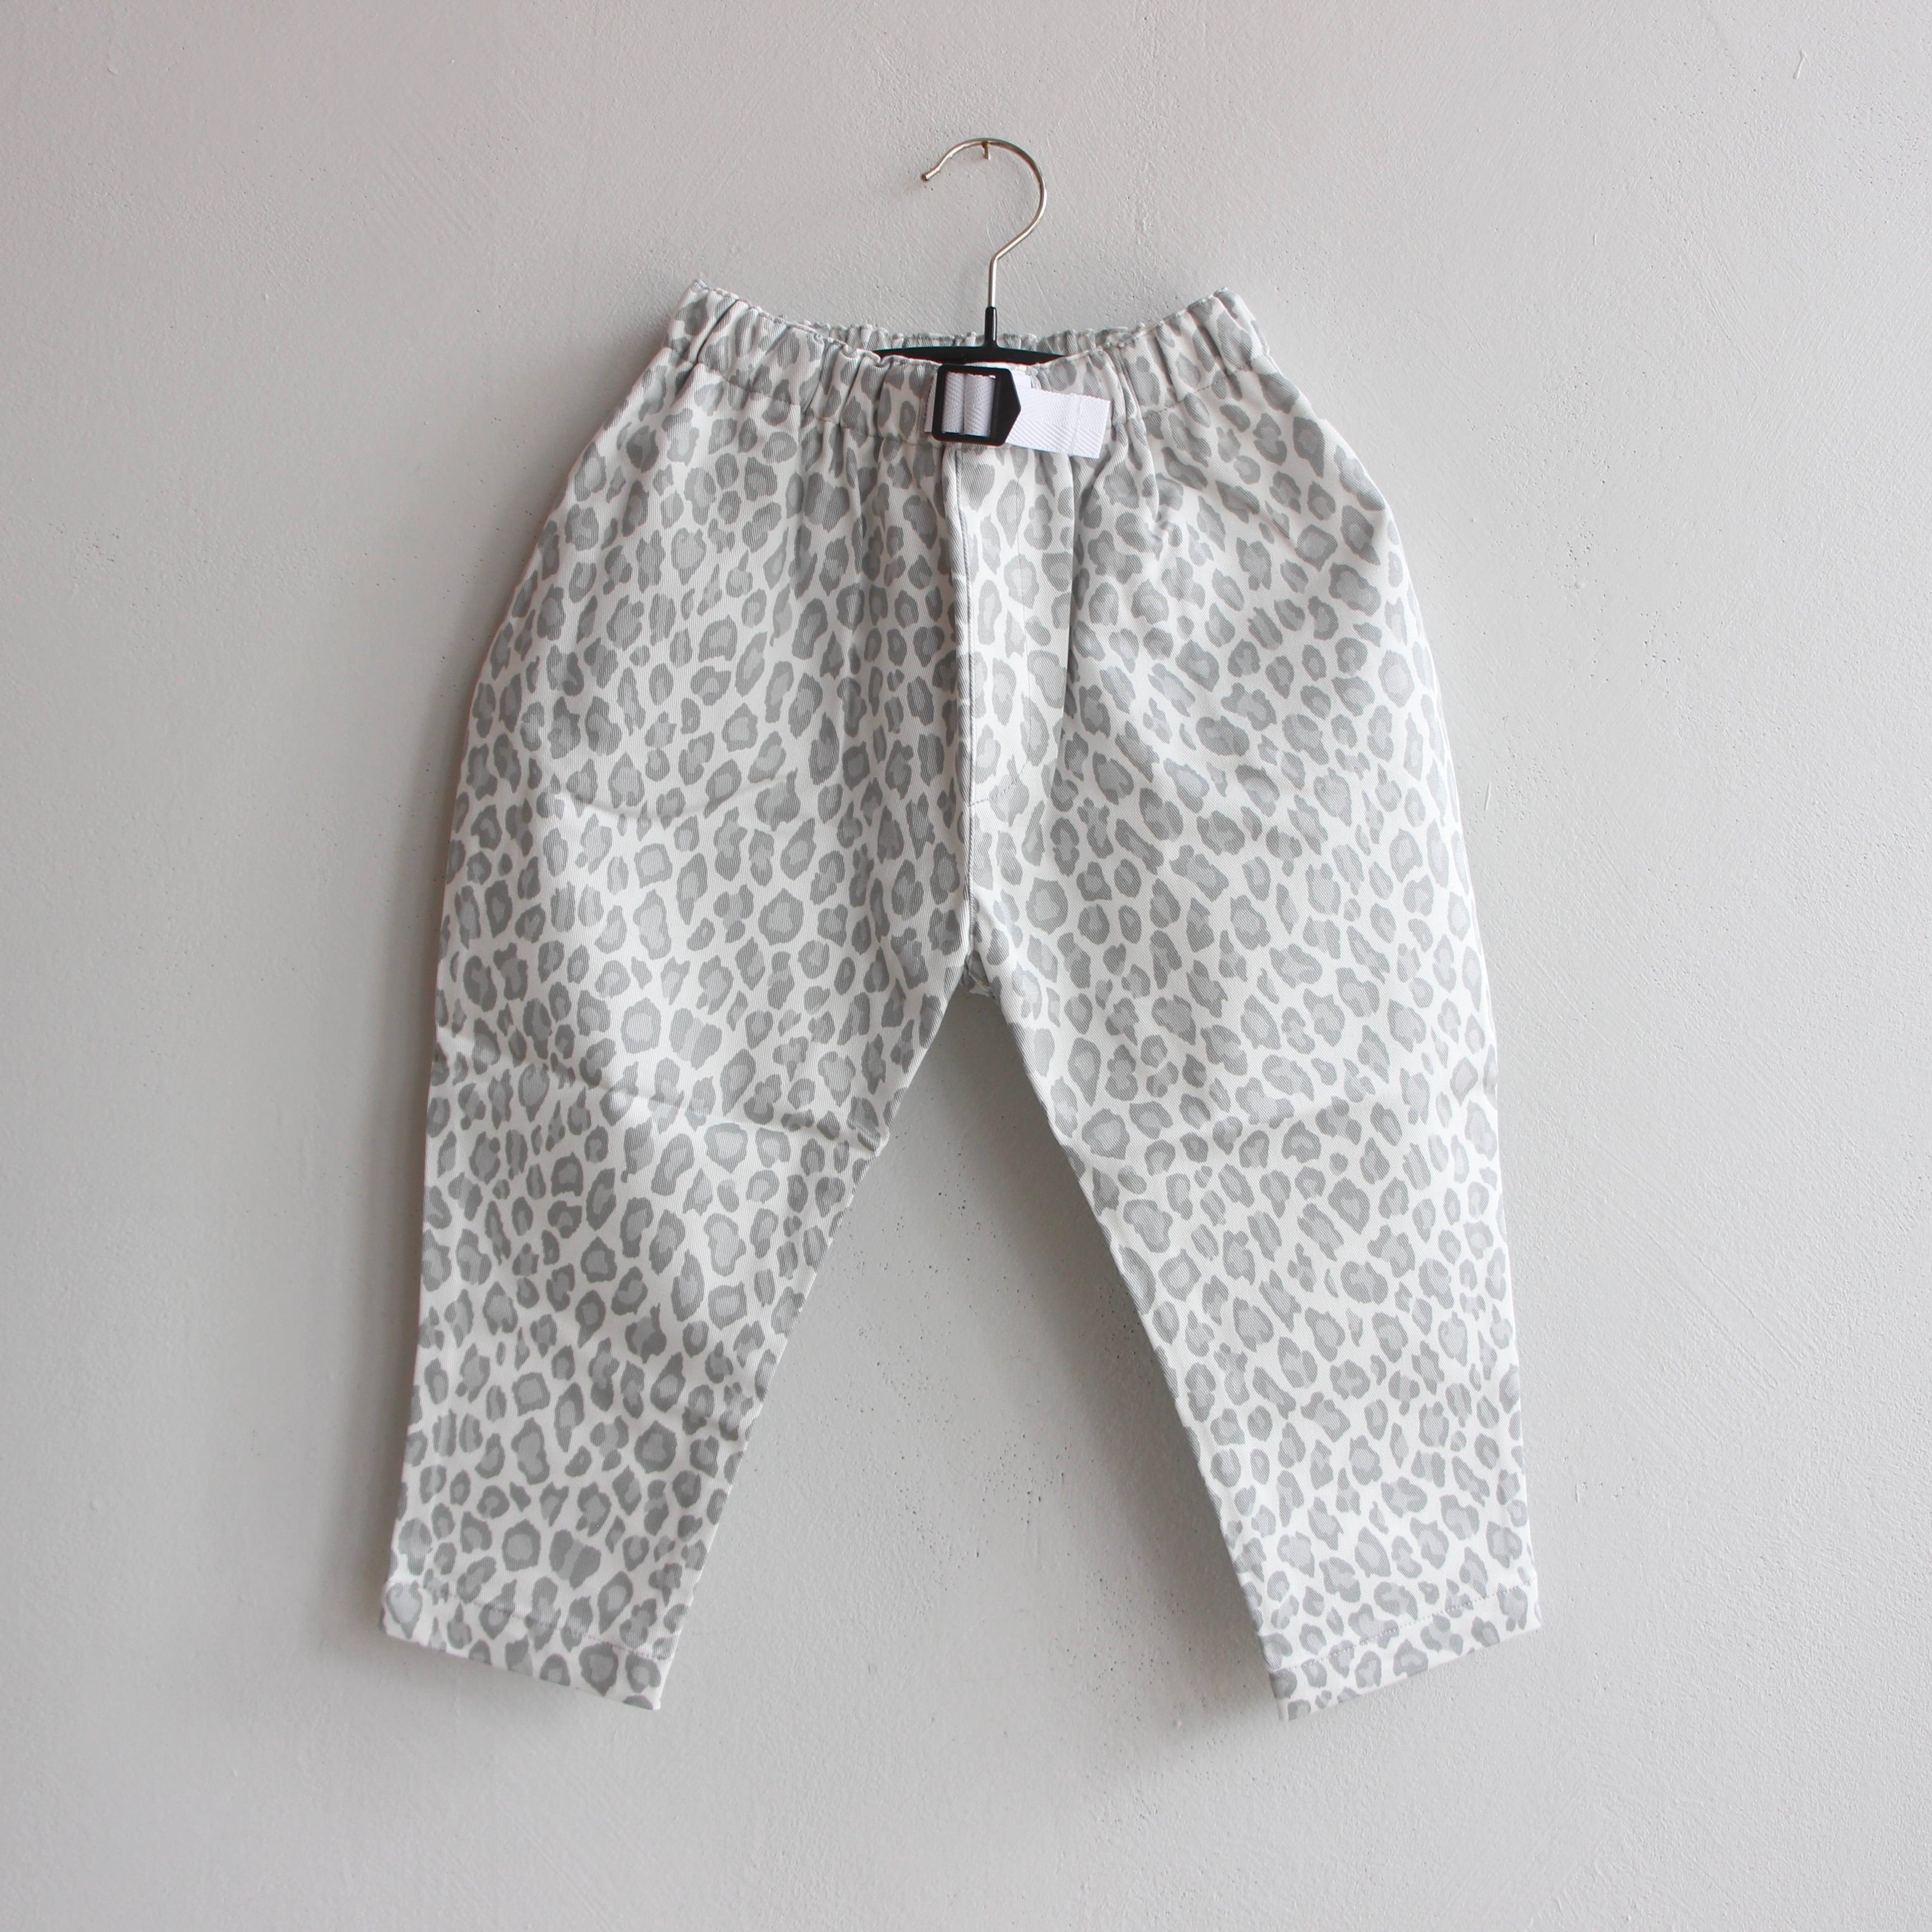 《eLfinFolk 2021AW》Snow leopard  pants / white / 140-150cm